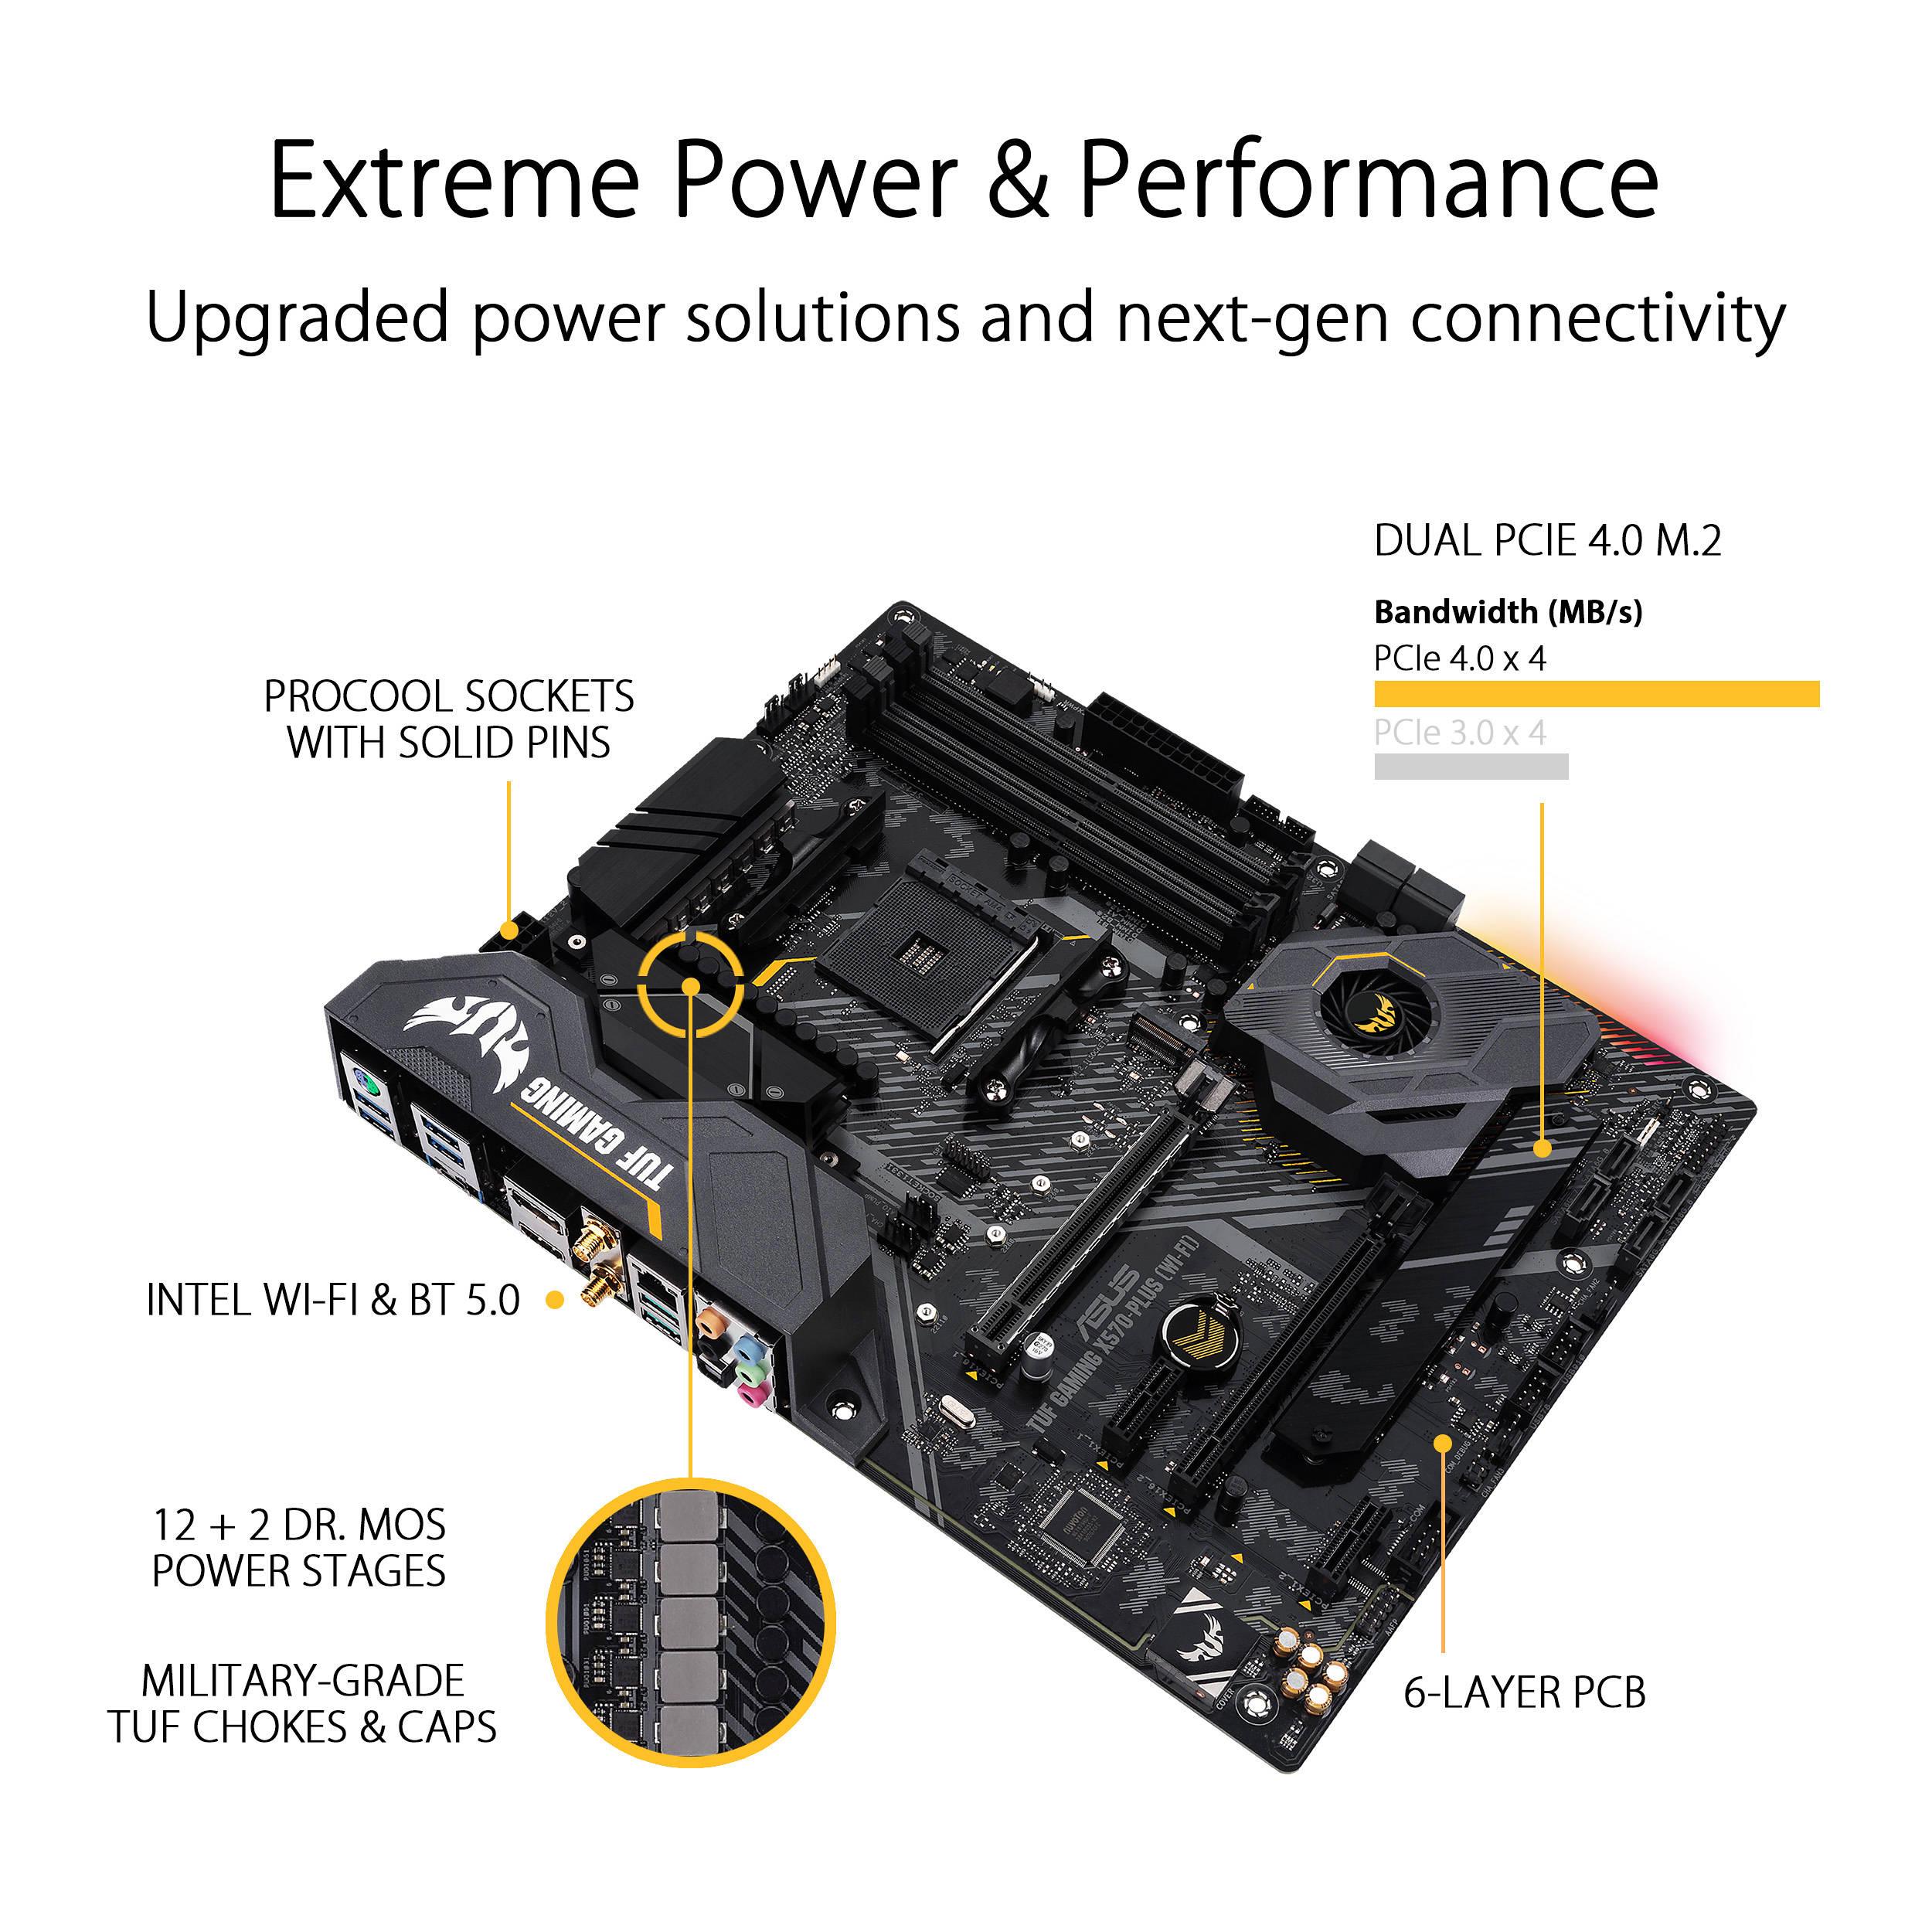 ASUS TUF GAMING X570-PLUS (Wi-Fi) AM4 ATX Motherboard